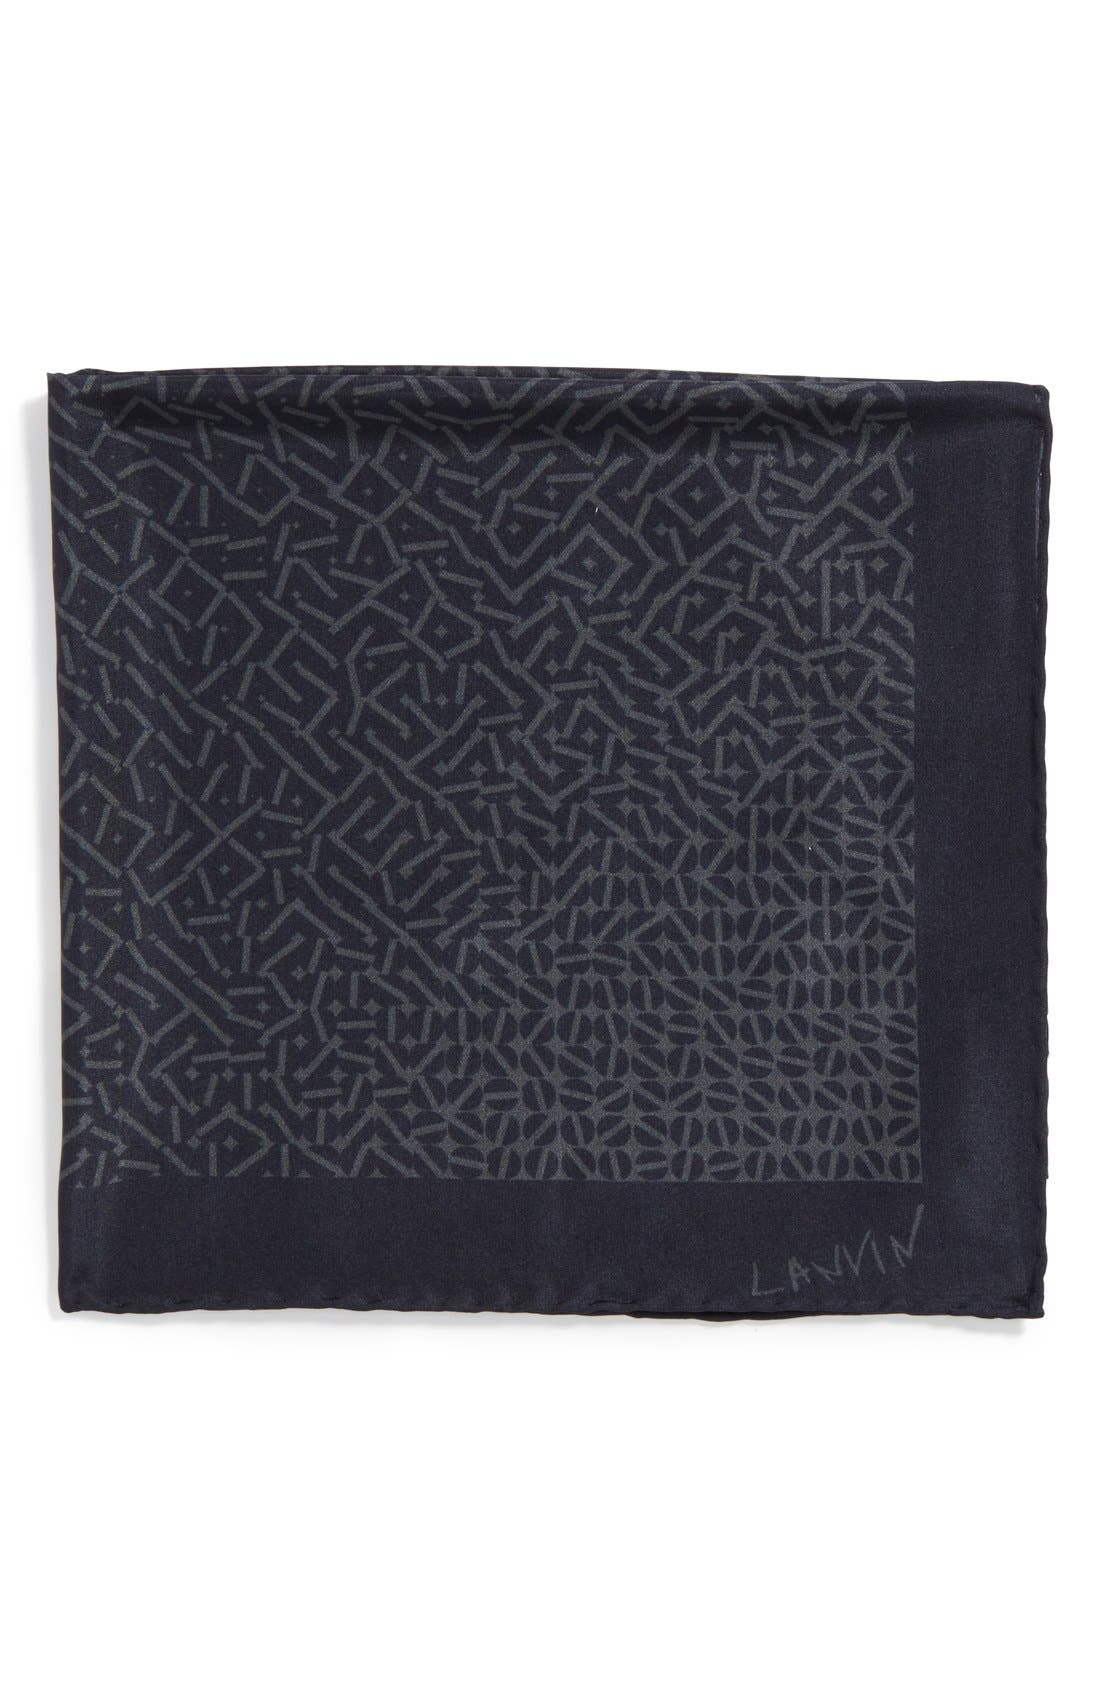 Alternate Image 1 Selected - Lanvin Print Pocket Square